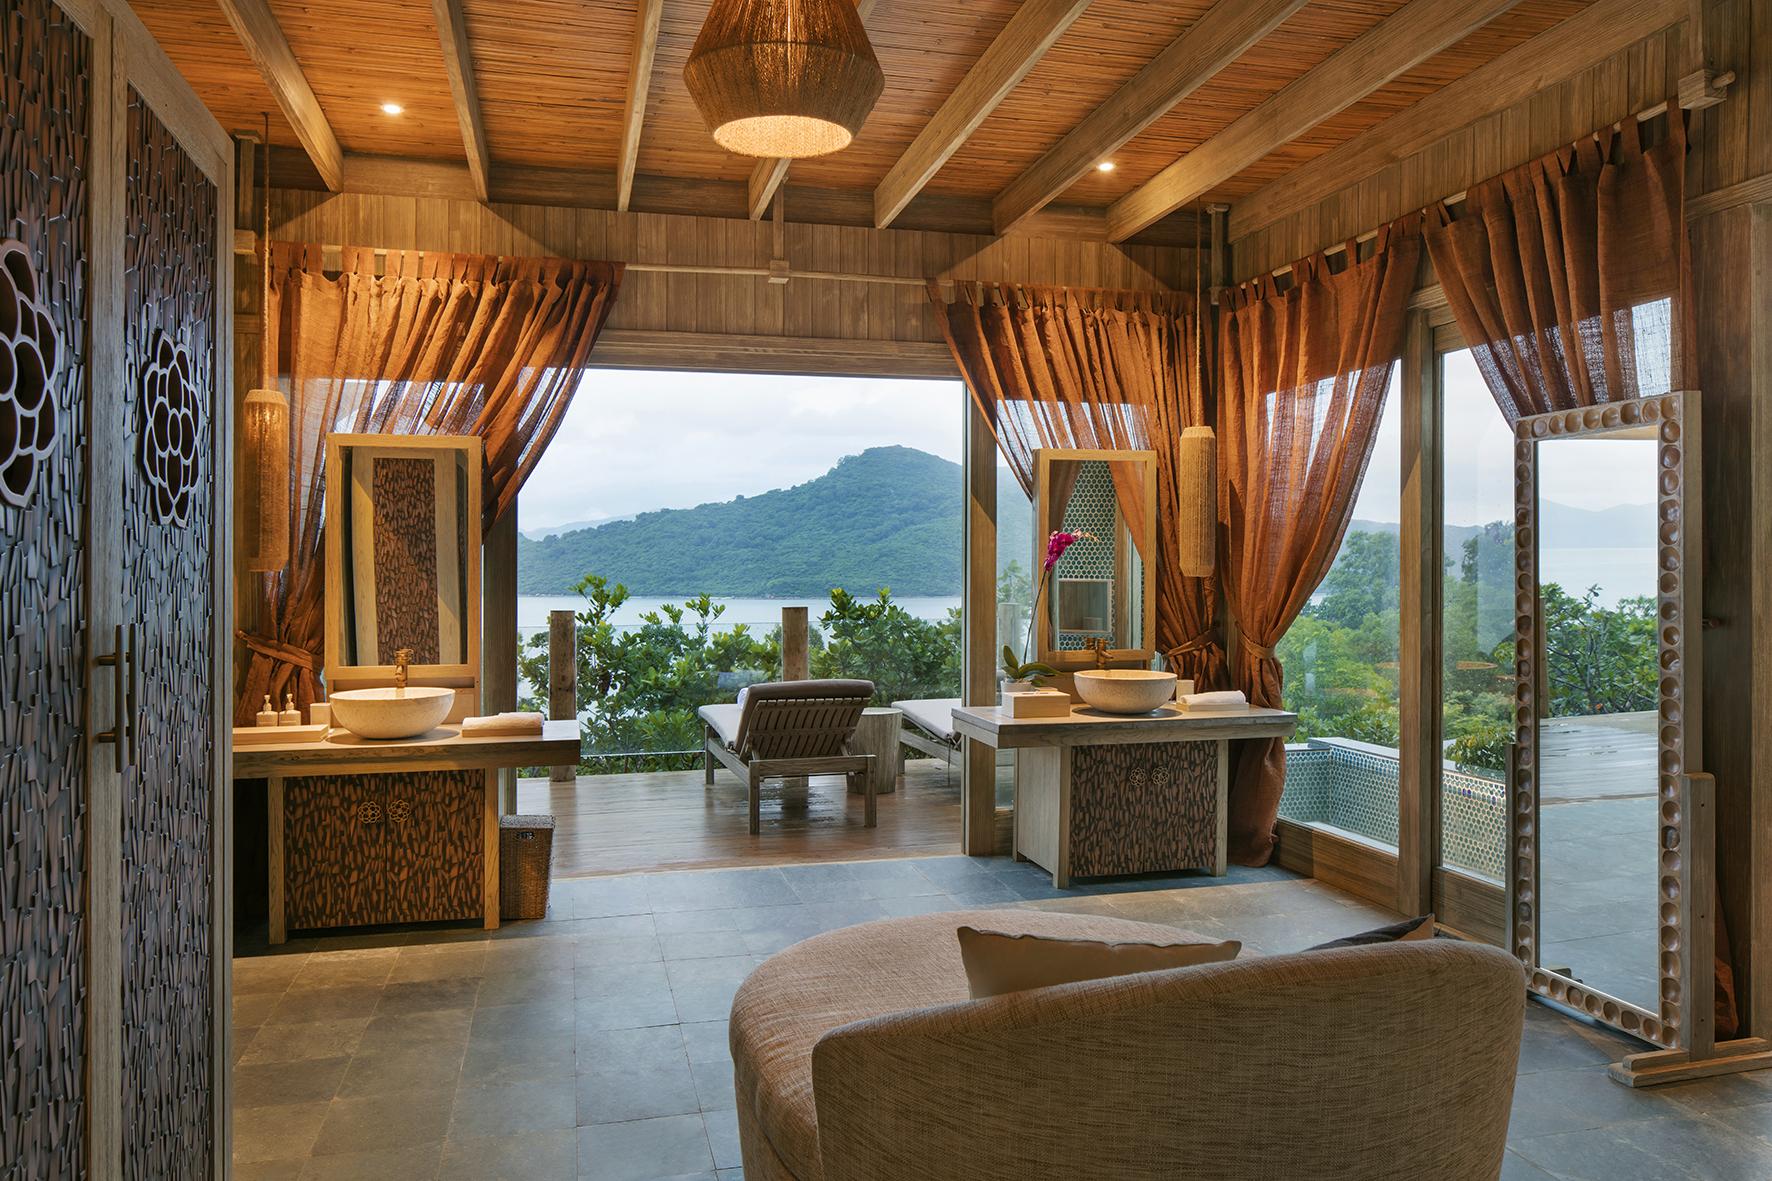 Professional Hotel & Resort Photographer